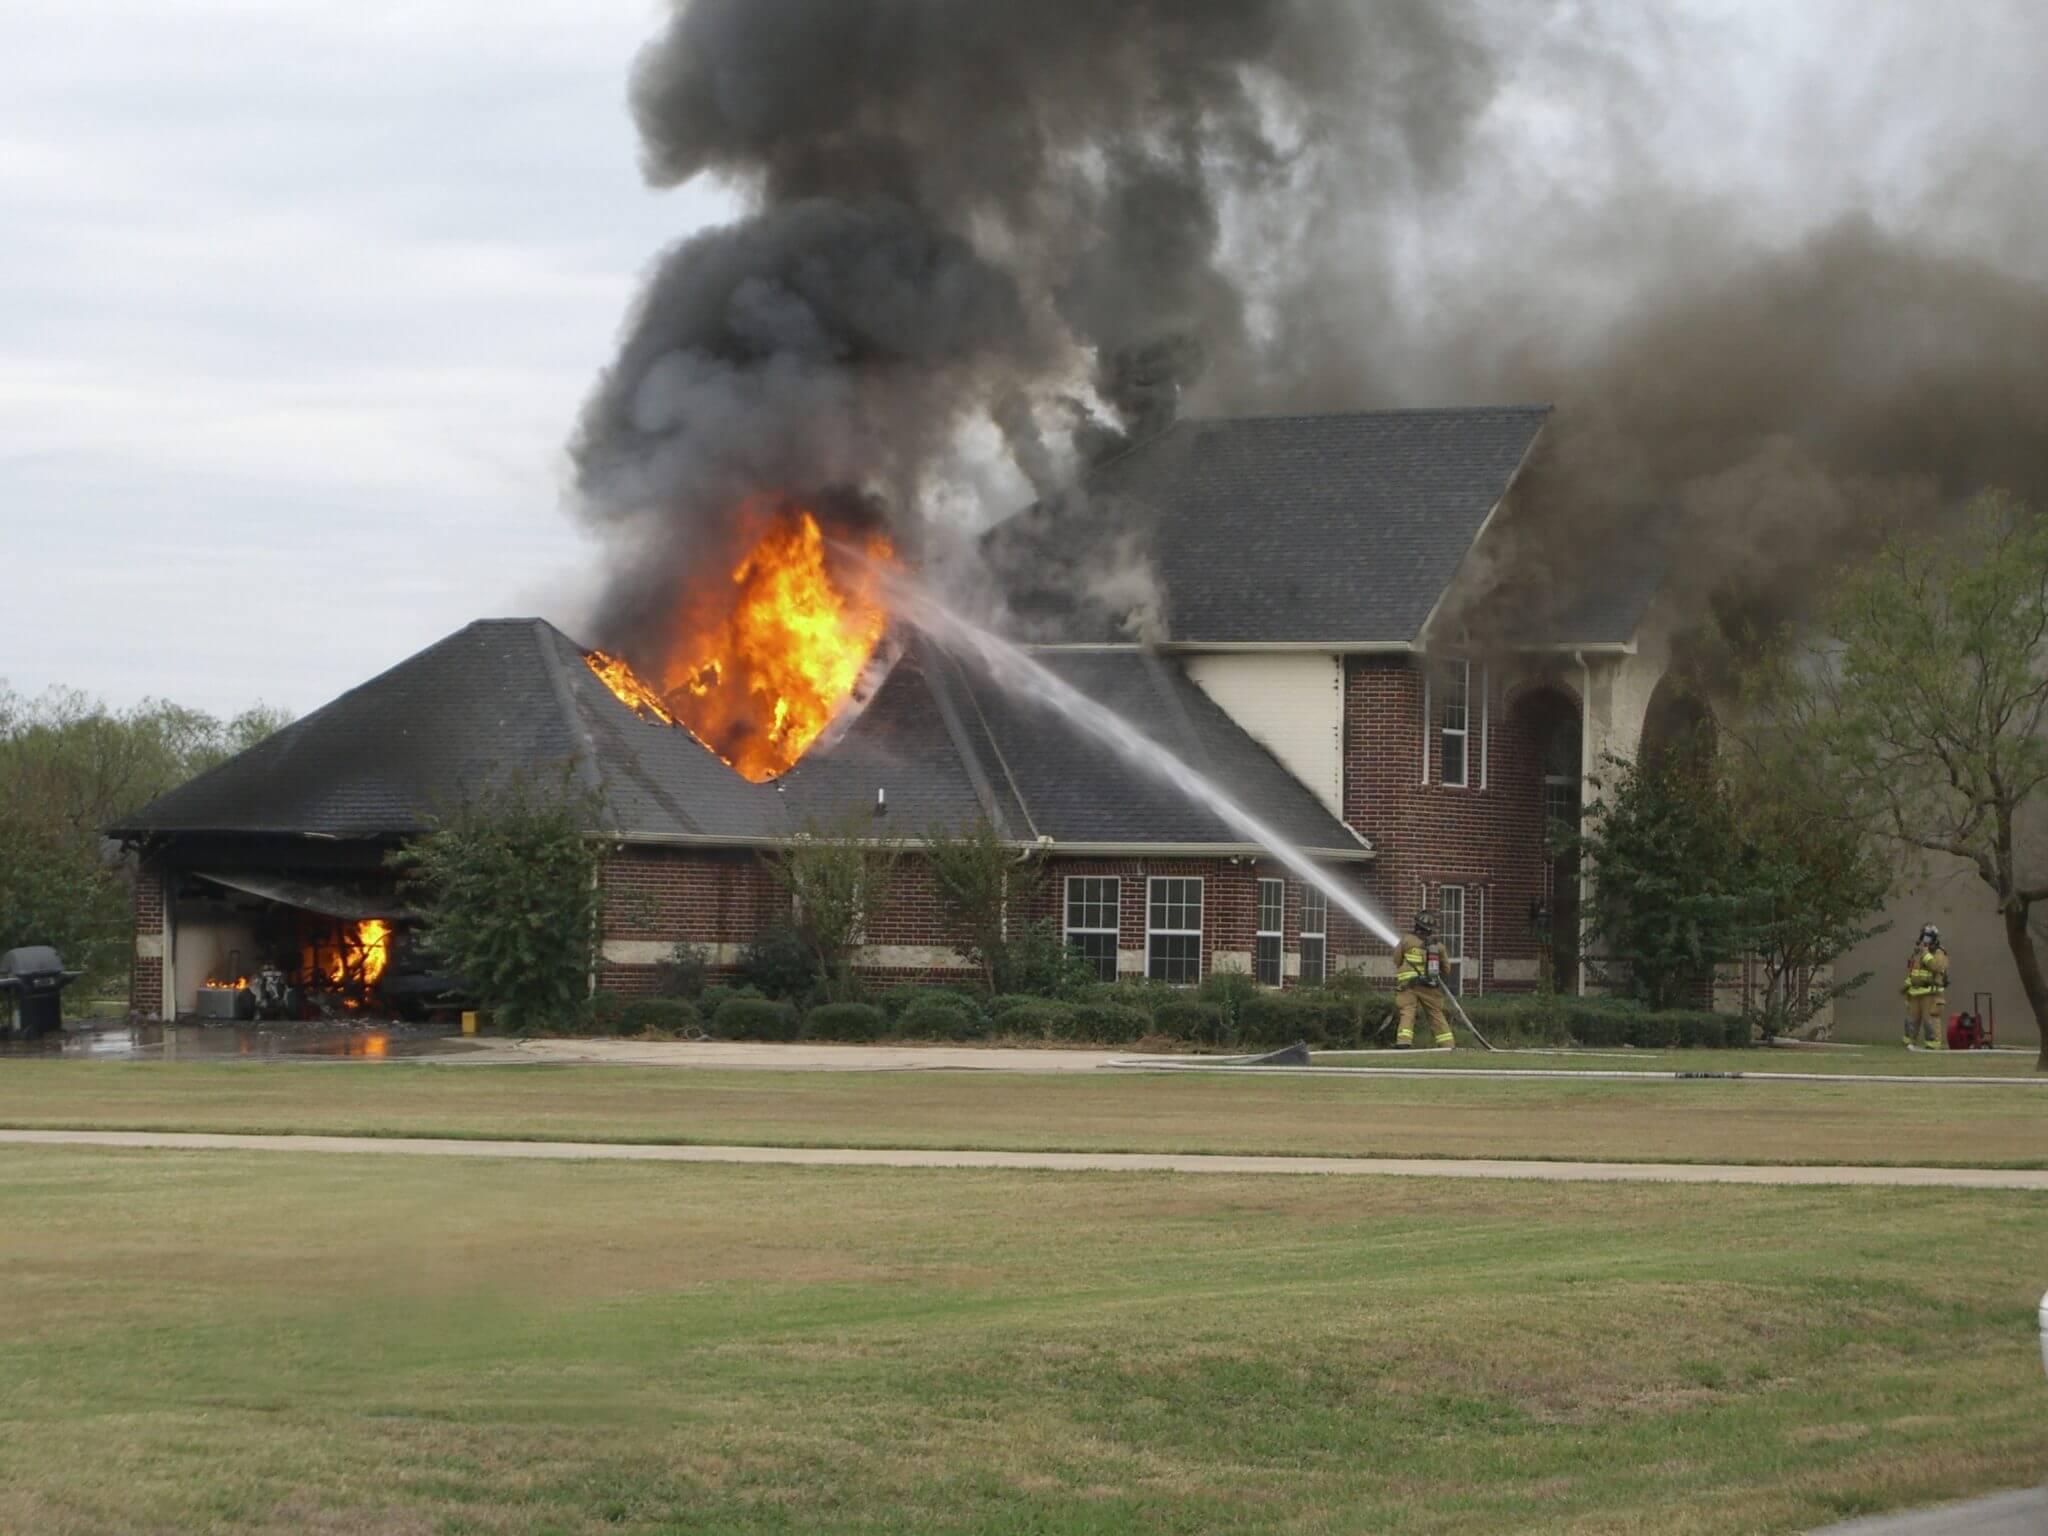 A Burning House & Fireman